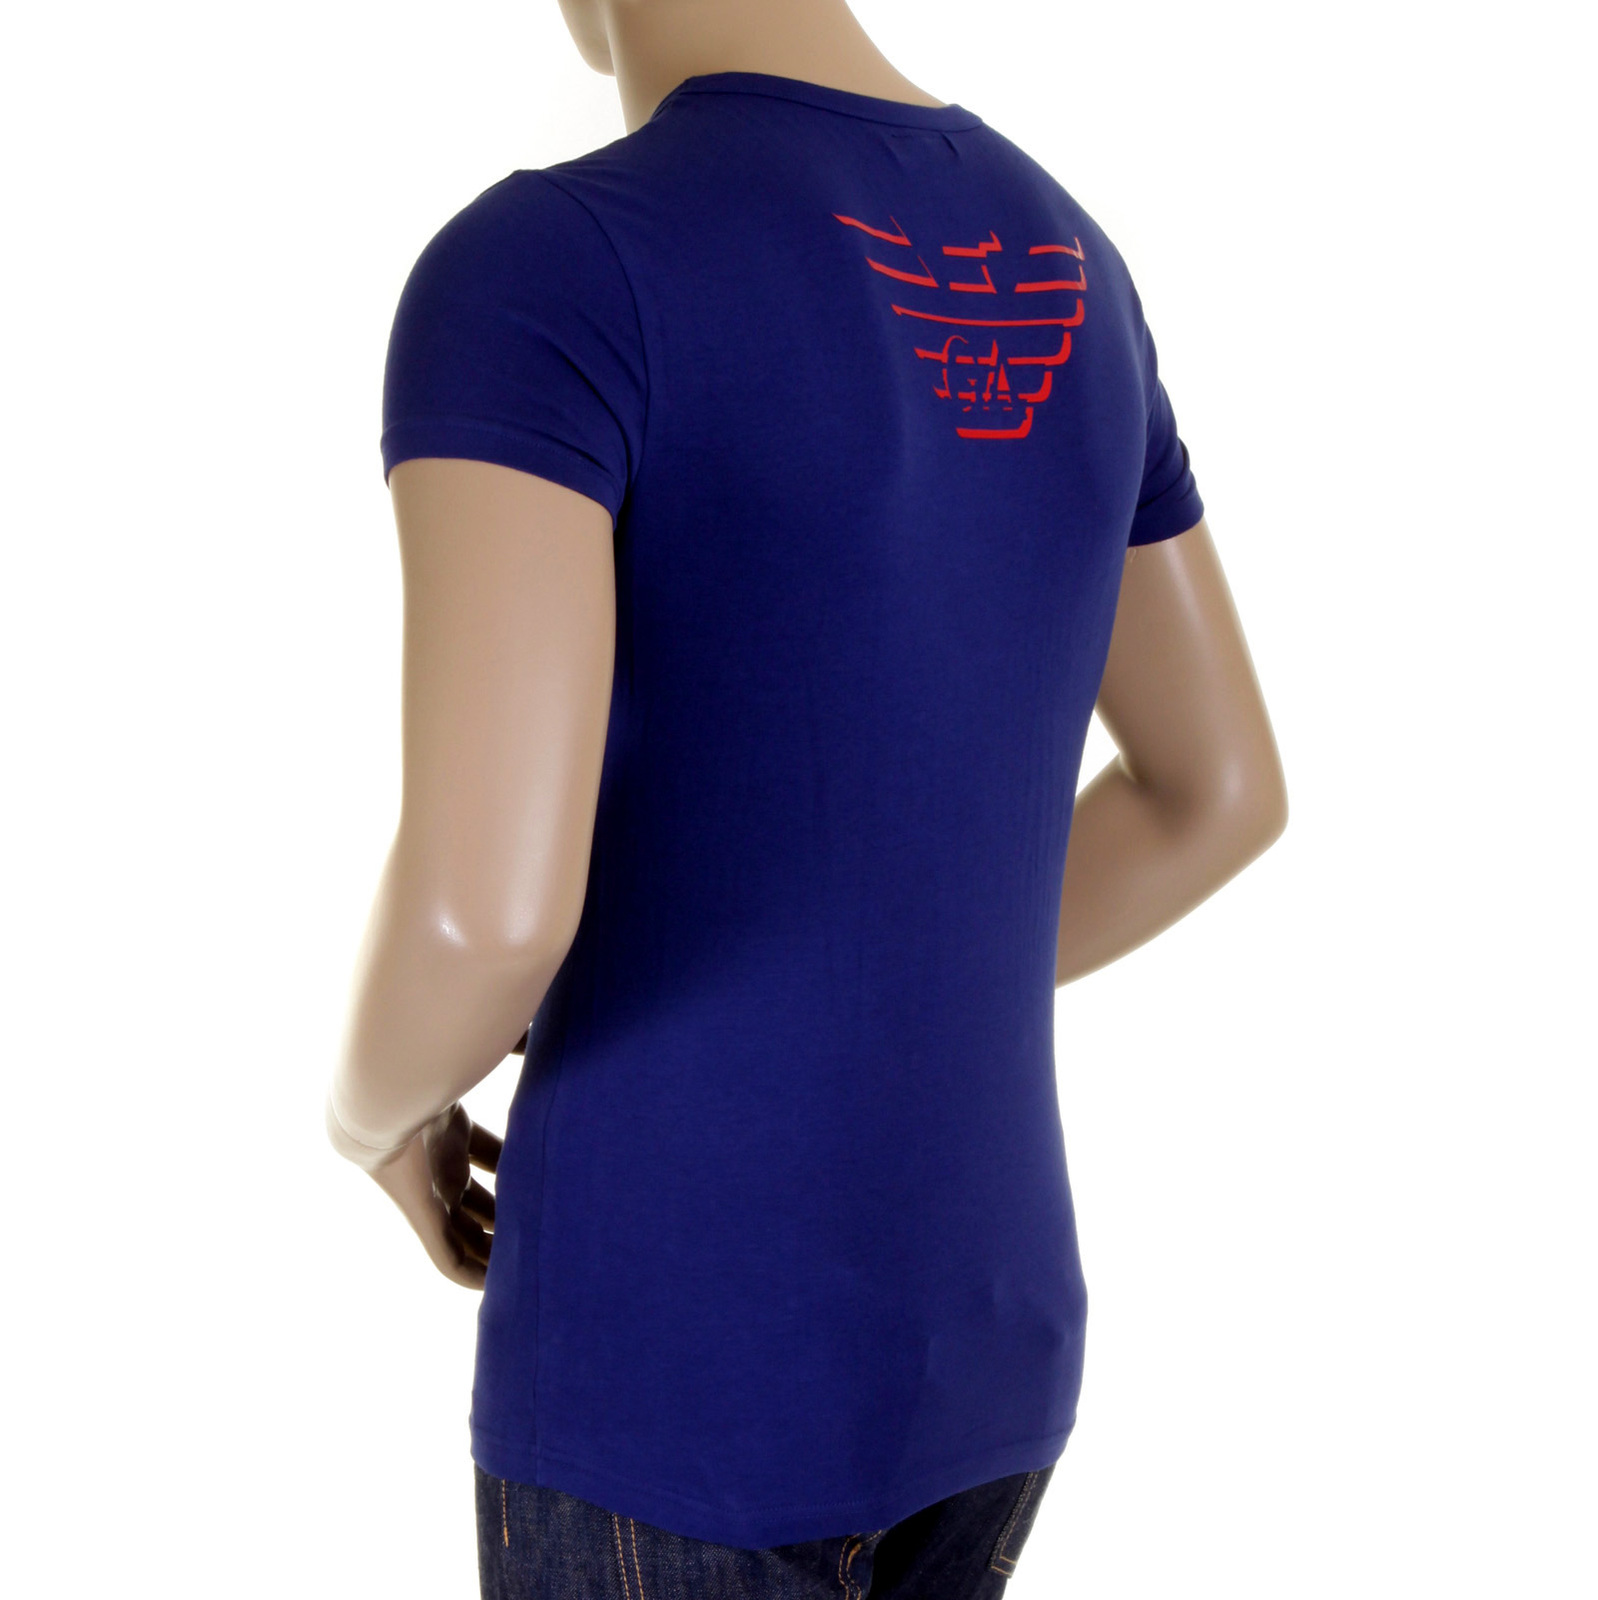 f5ca693044acc Emporio Armani t shirt china blue v neck t shirt 110752 1S512 EAM1506